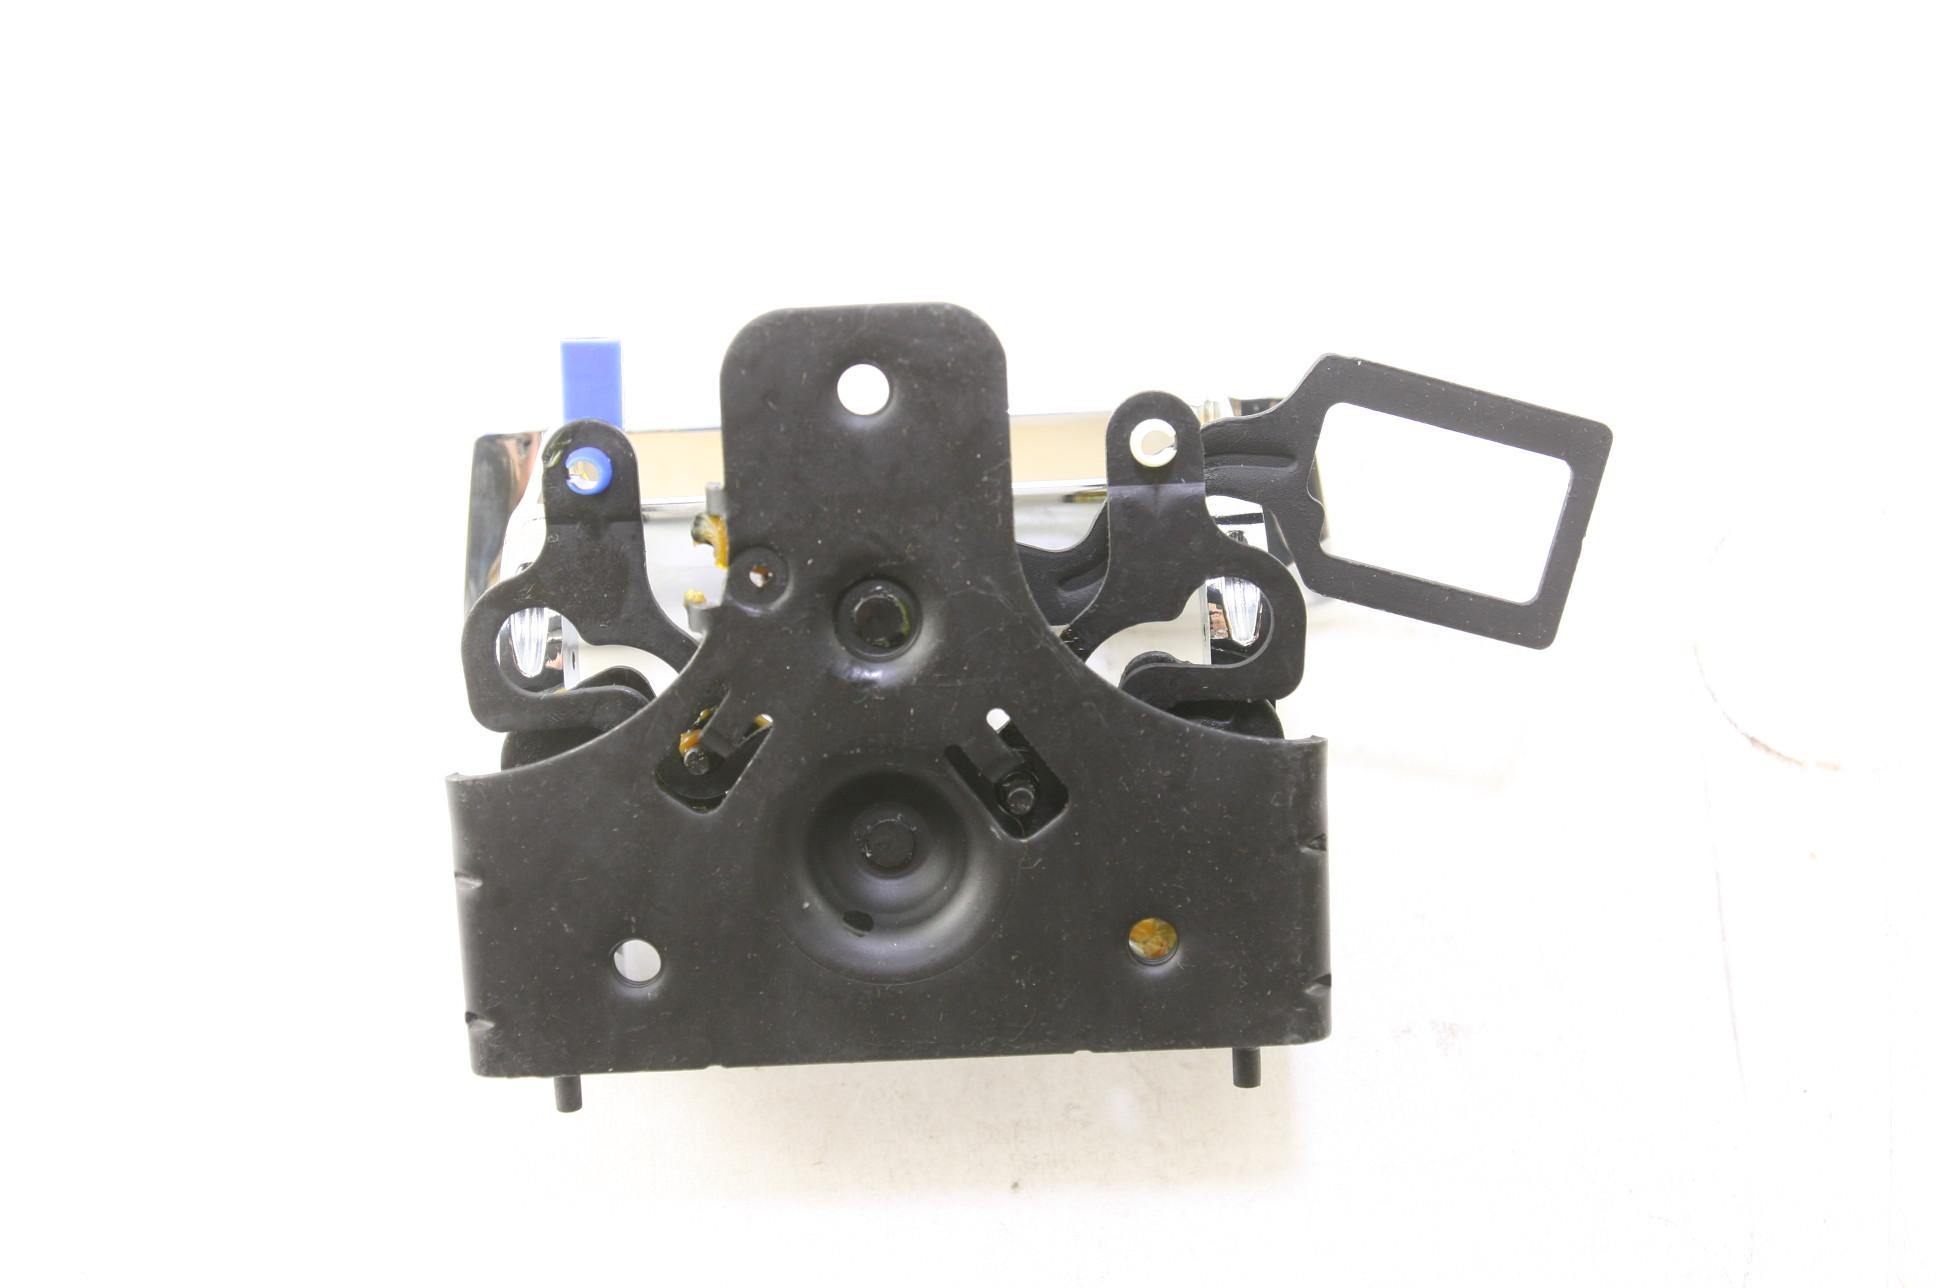 *** New OEM 19212858 GM Locking Tailgate Handle Kit 07-13 Silverado Sierra - image 8